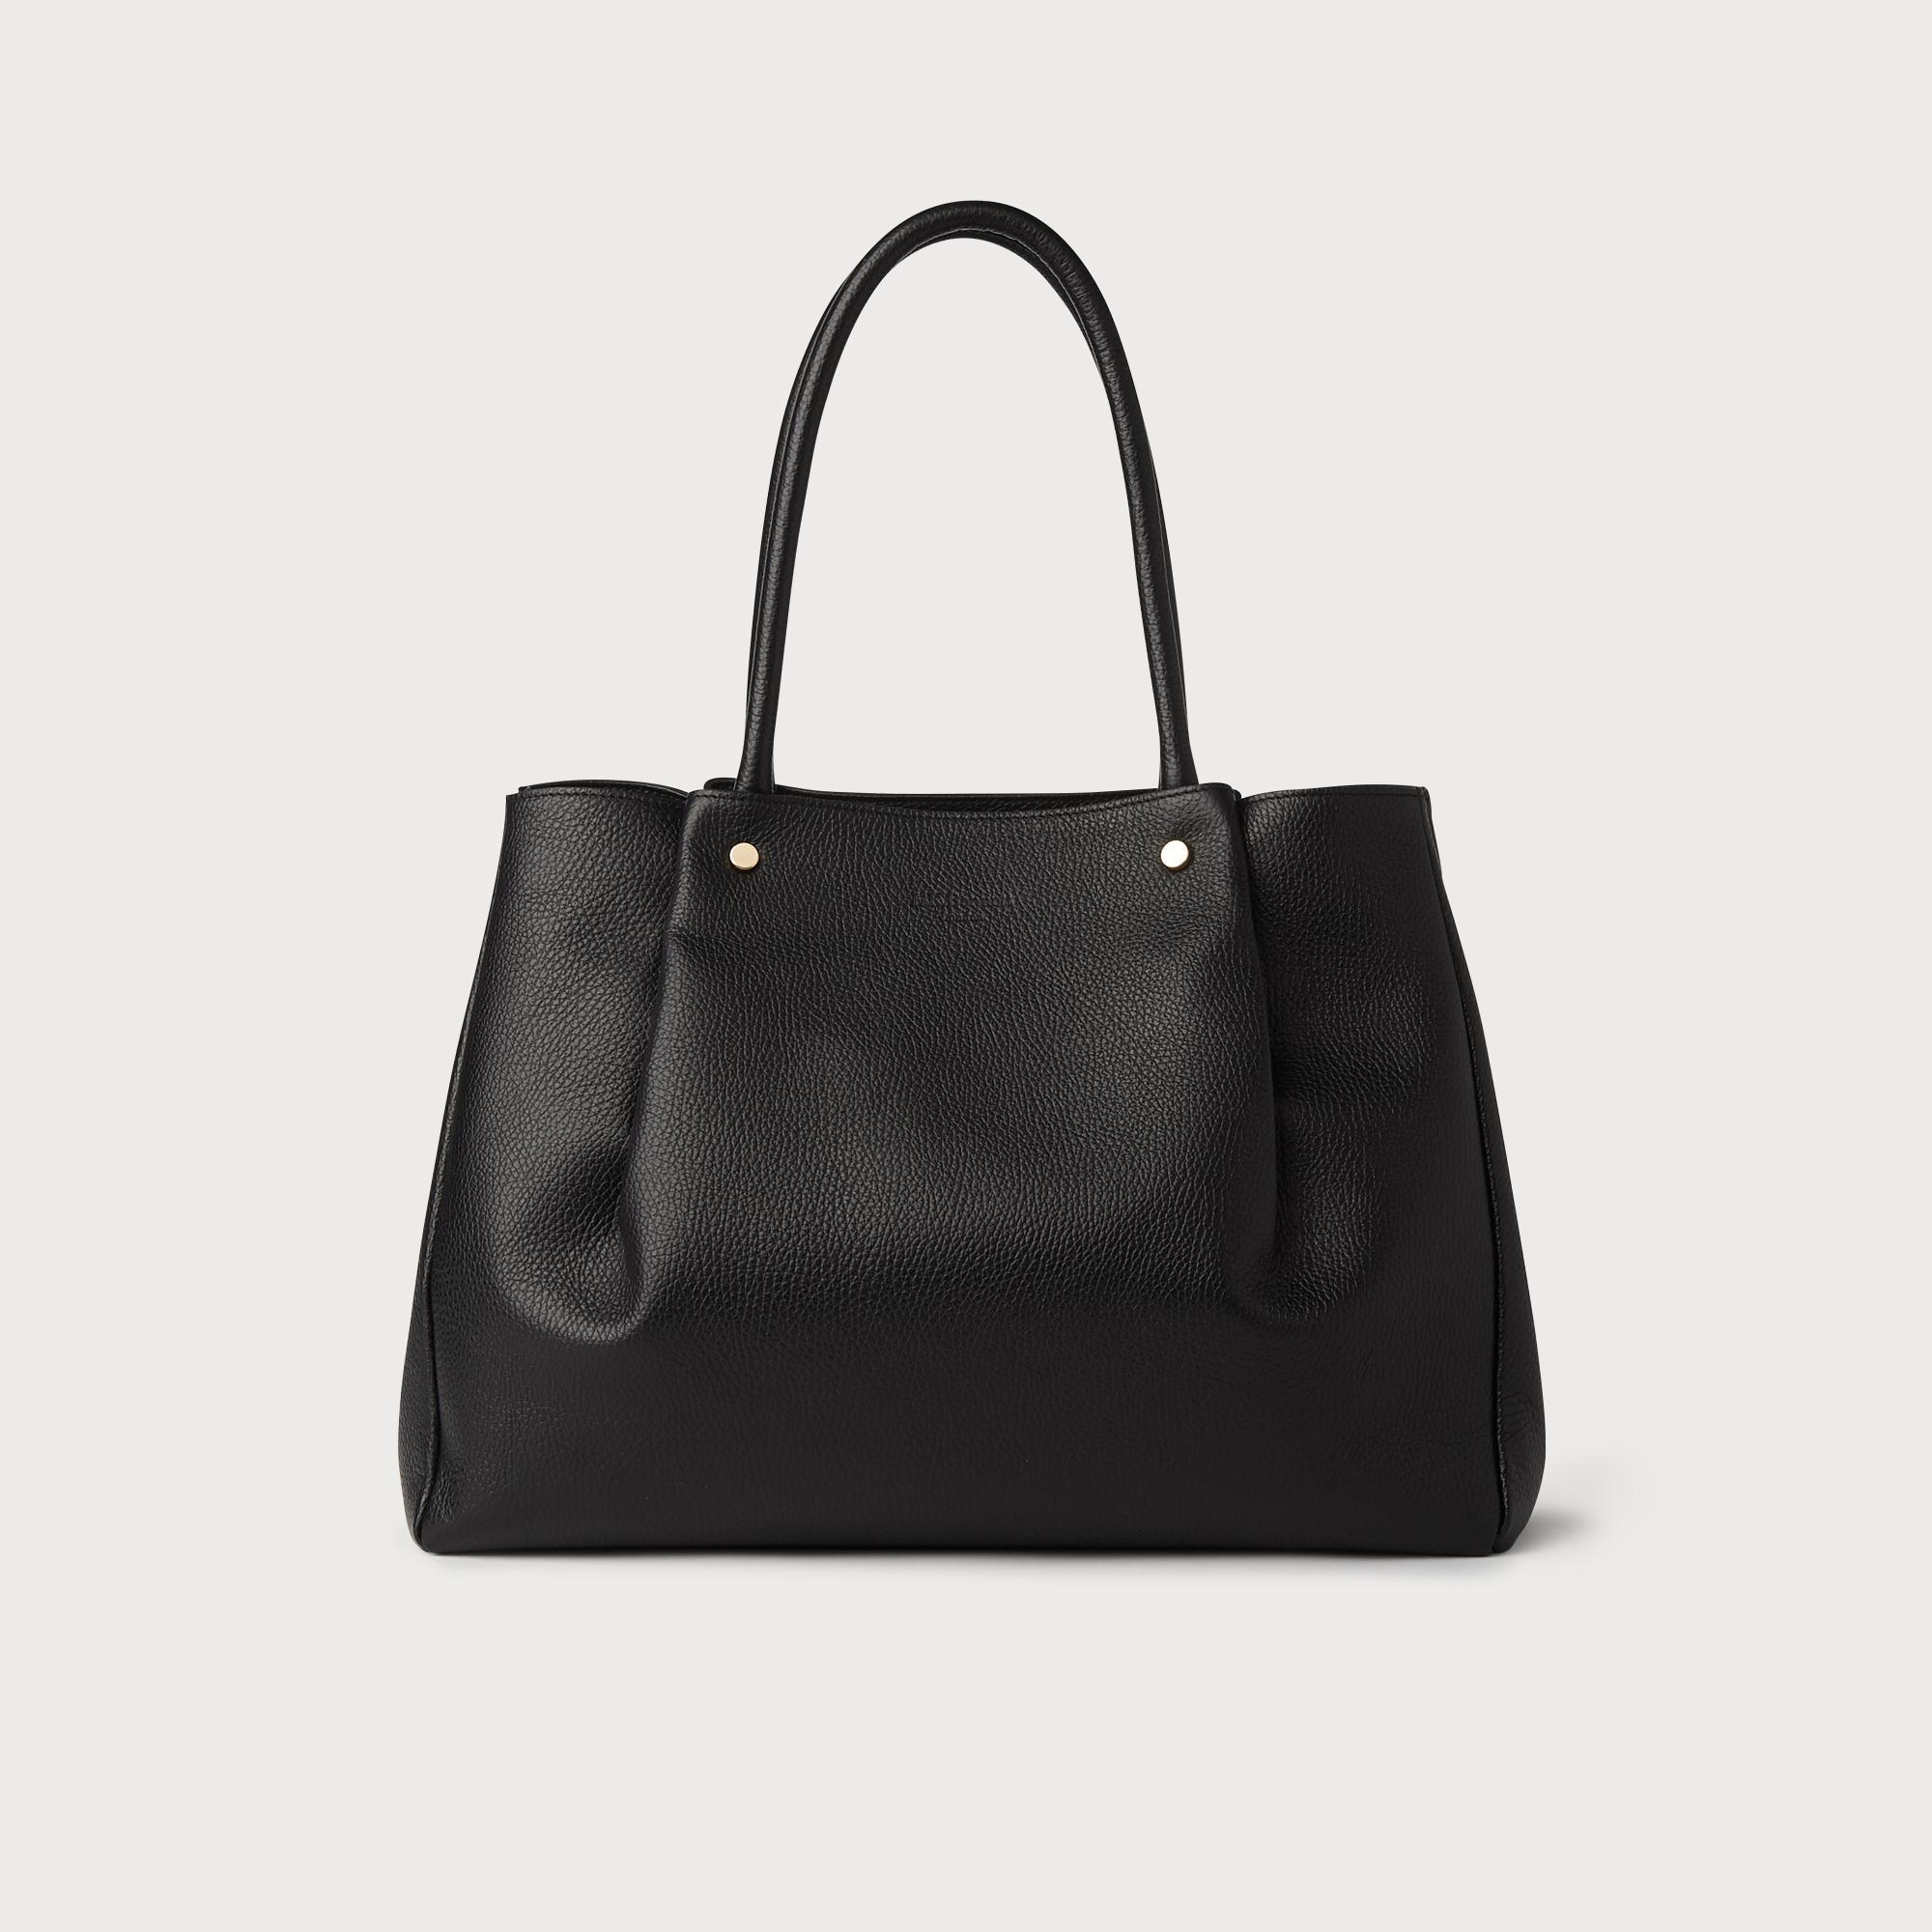 ea1691db853c Regan Black Leather Tote Bag